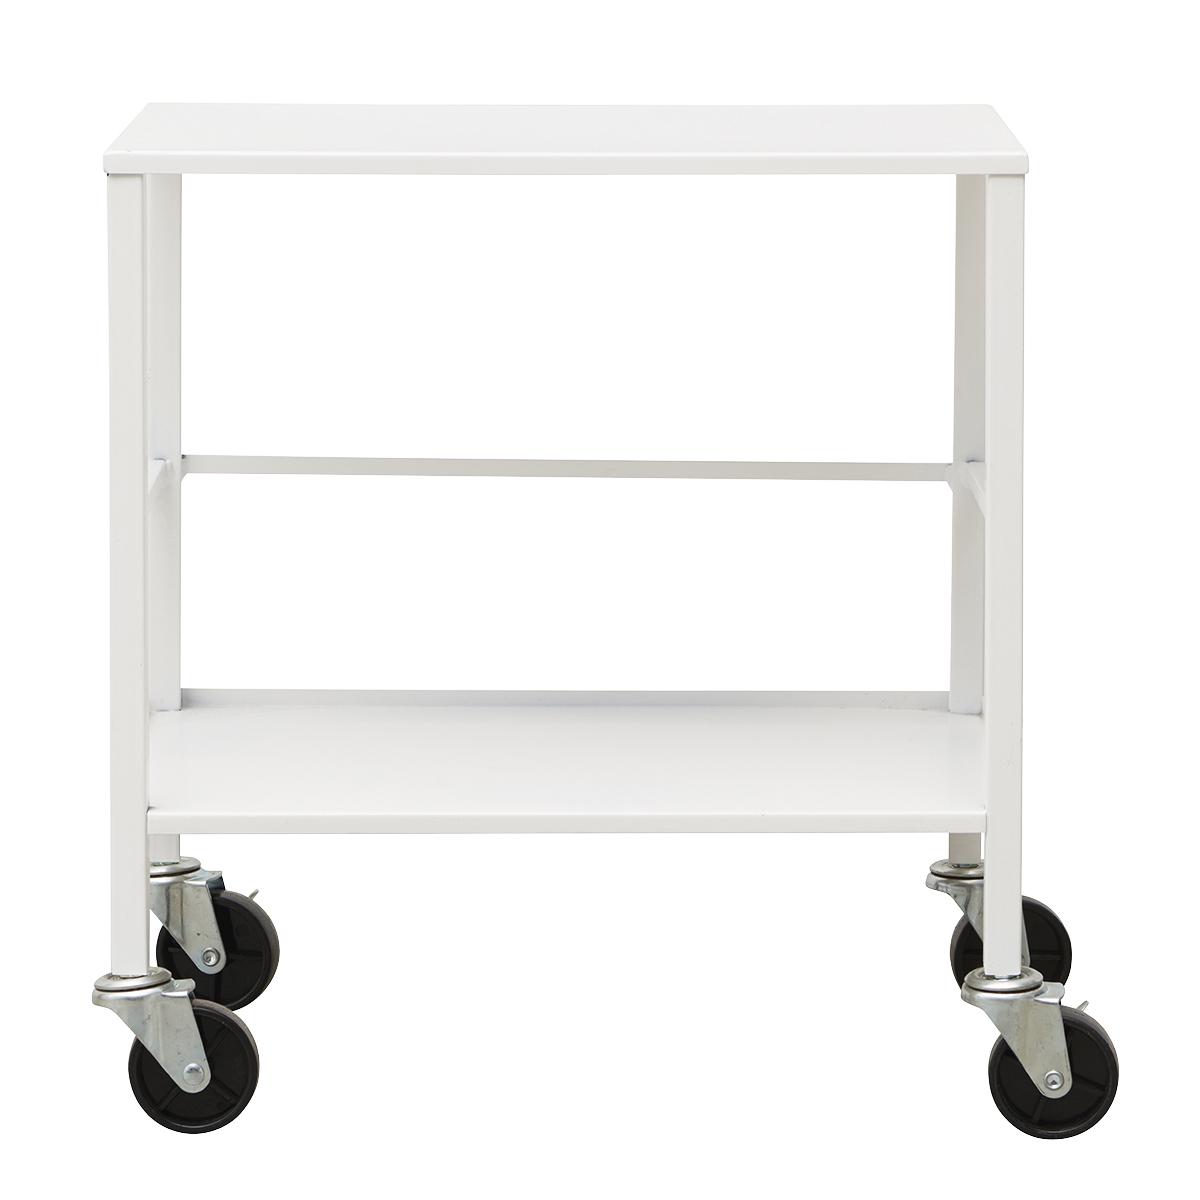 House doctor office trolley - hvid metal, 2 hylder, (55x35cm) fra house doctor fra boboonline.dk